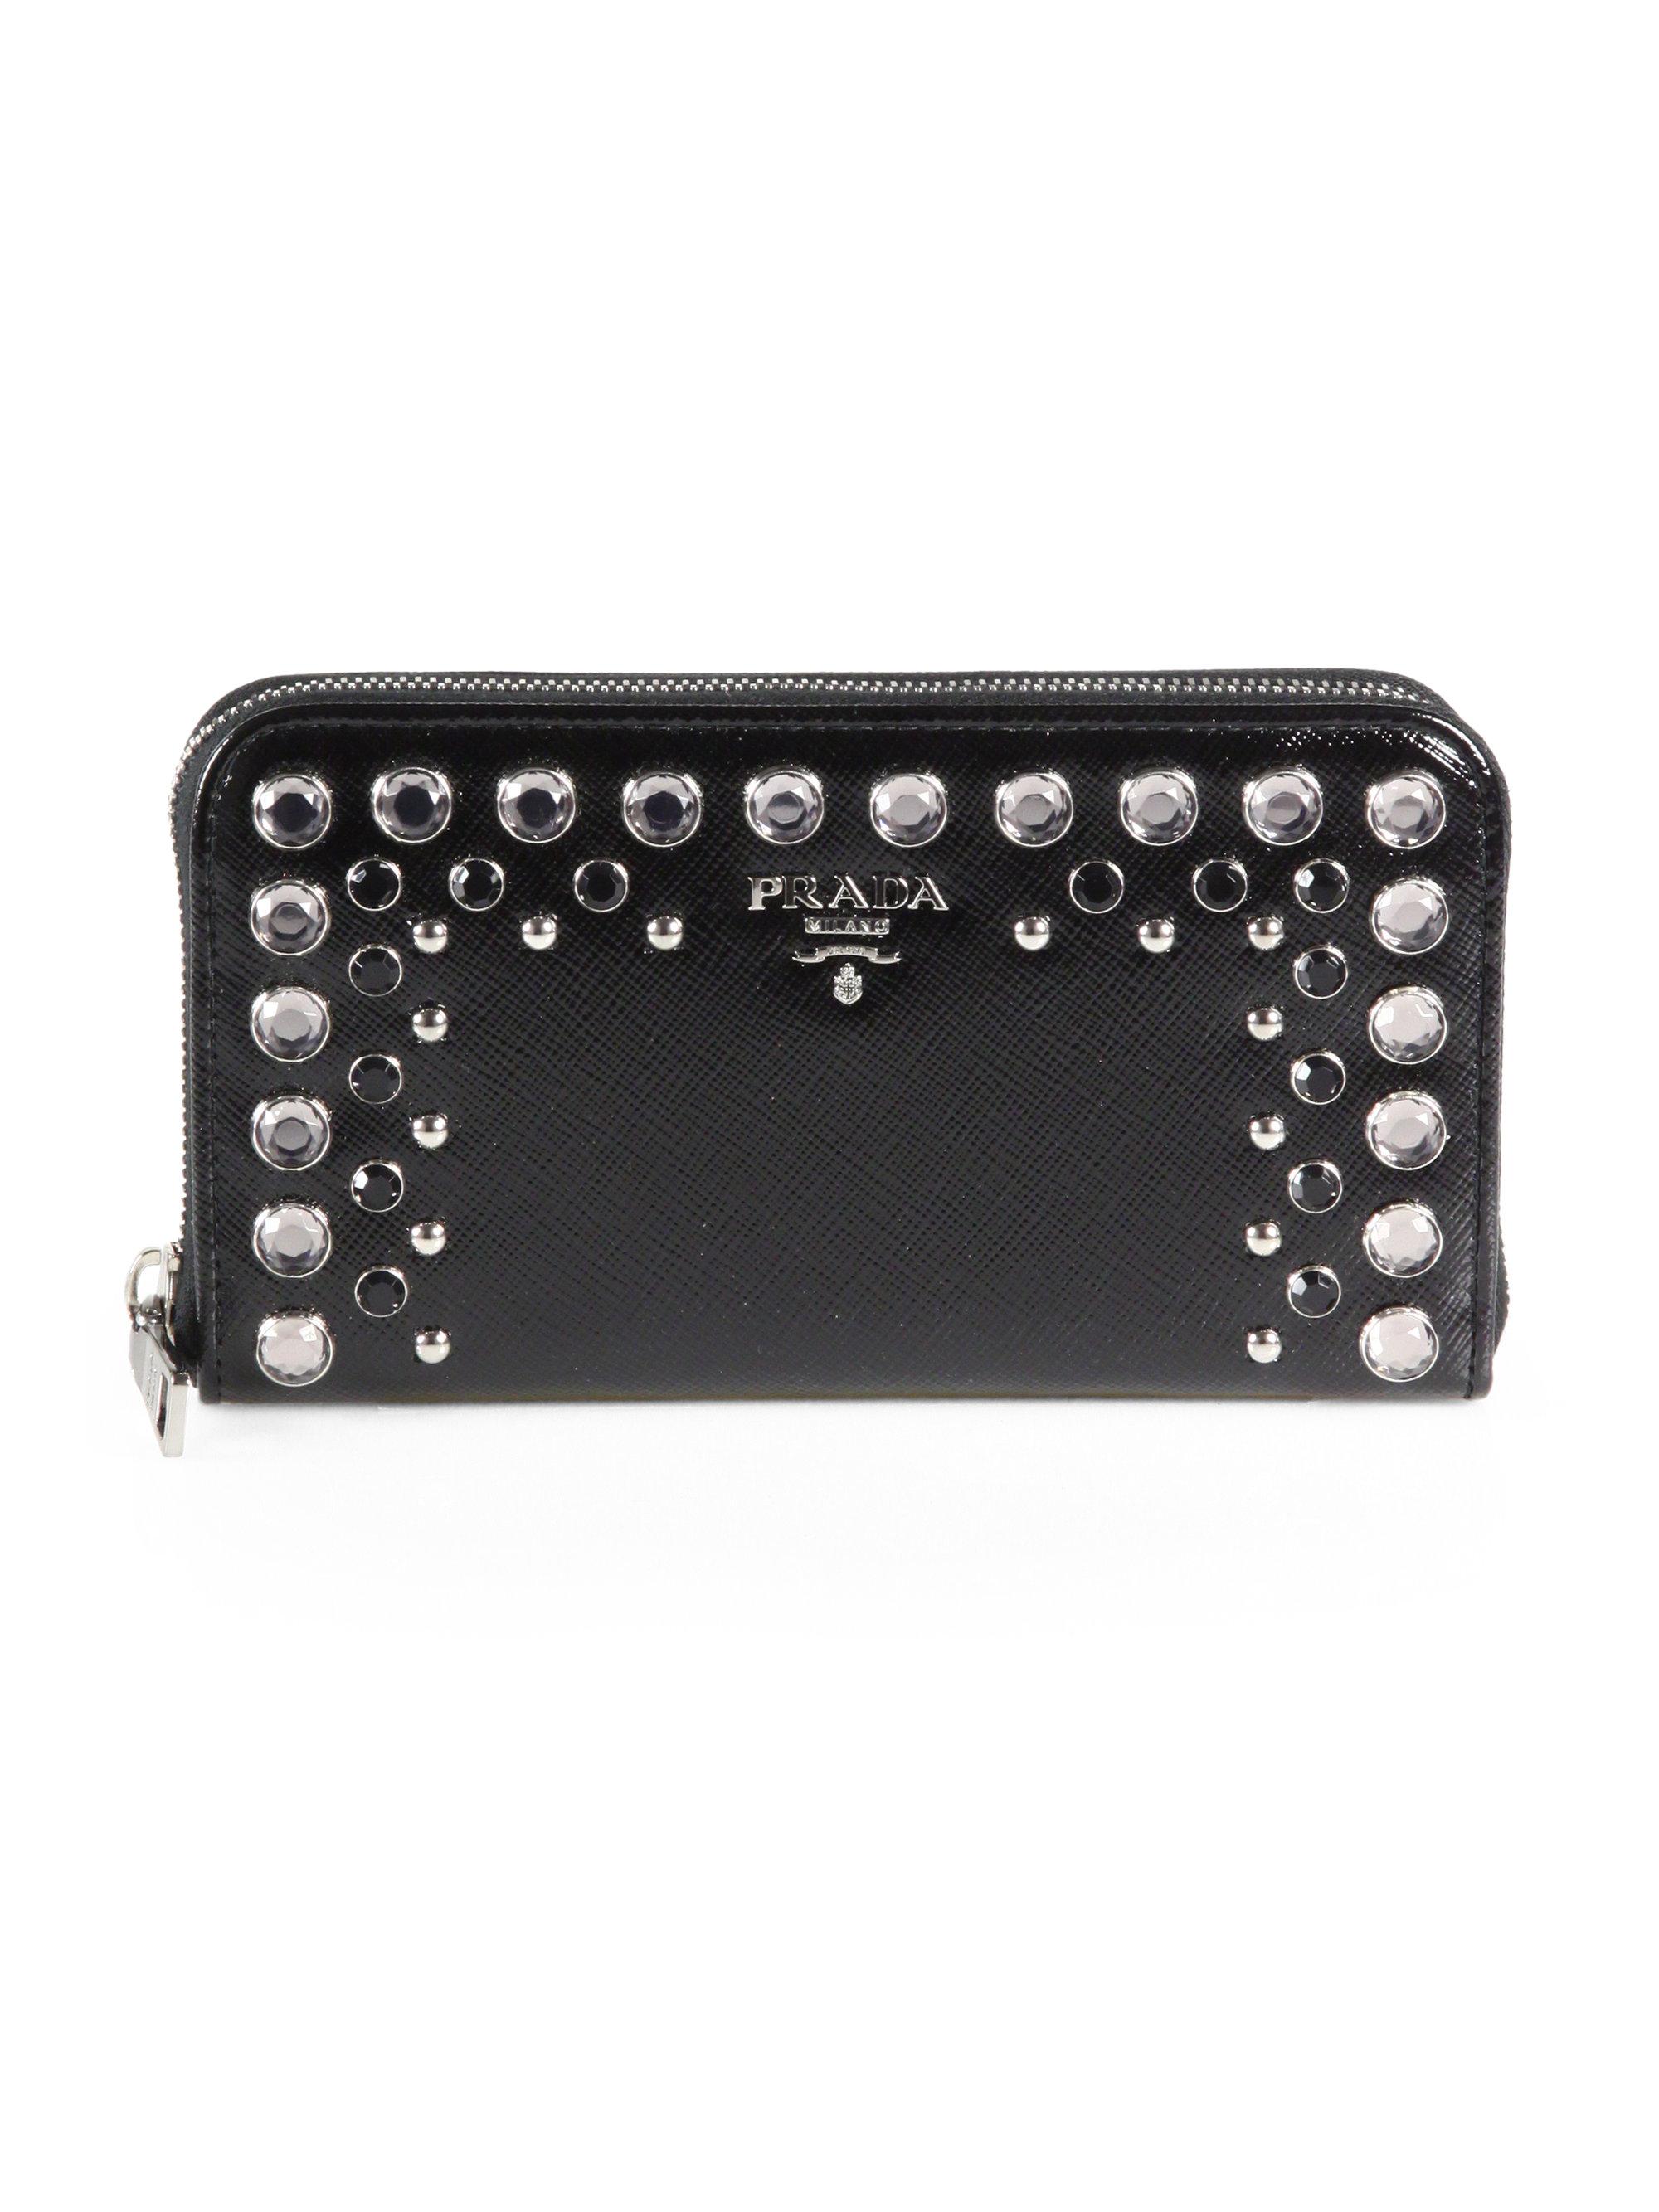 Prada Studded Saffiano Vernice Ziparound Wallet in Black (NERO ...